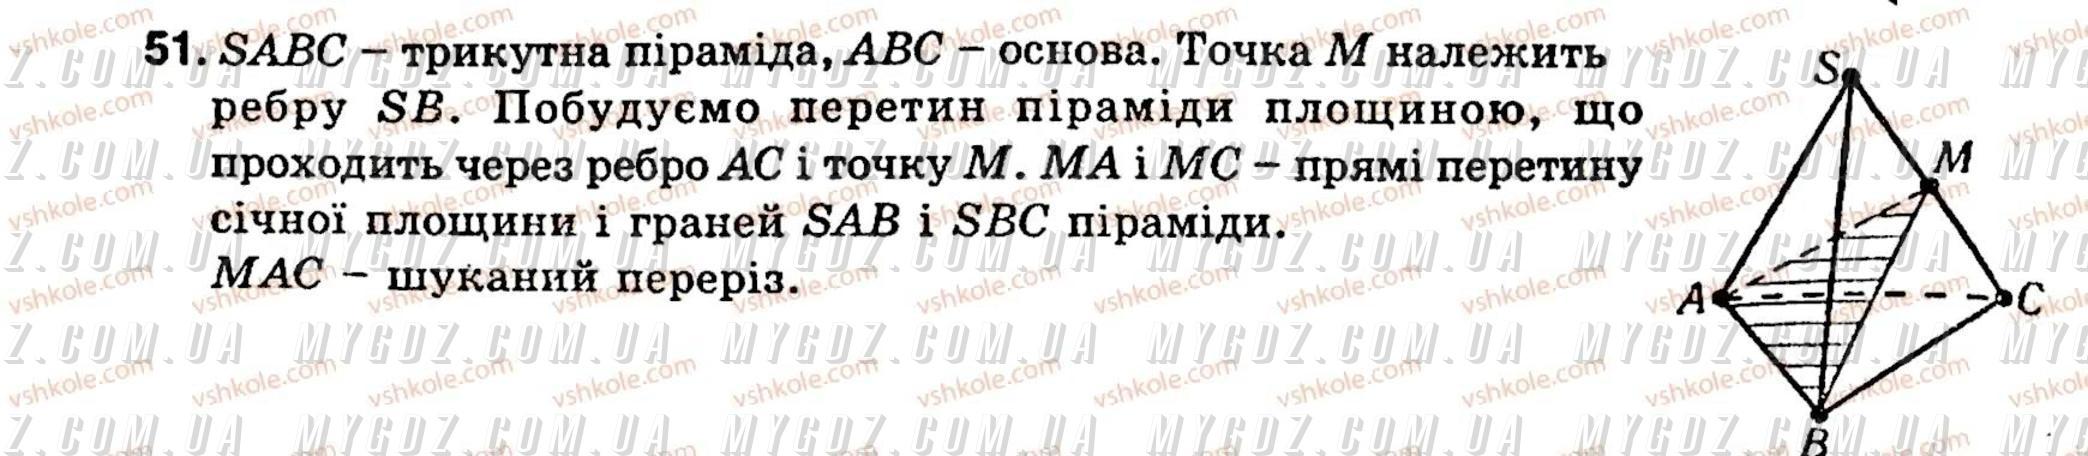 ГДЗ номер 51 2001 Погорєлов 11 клас